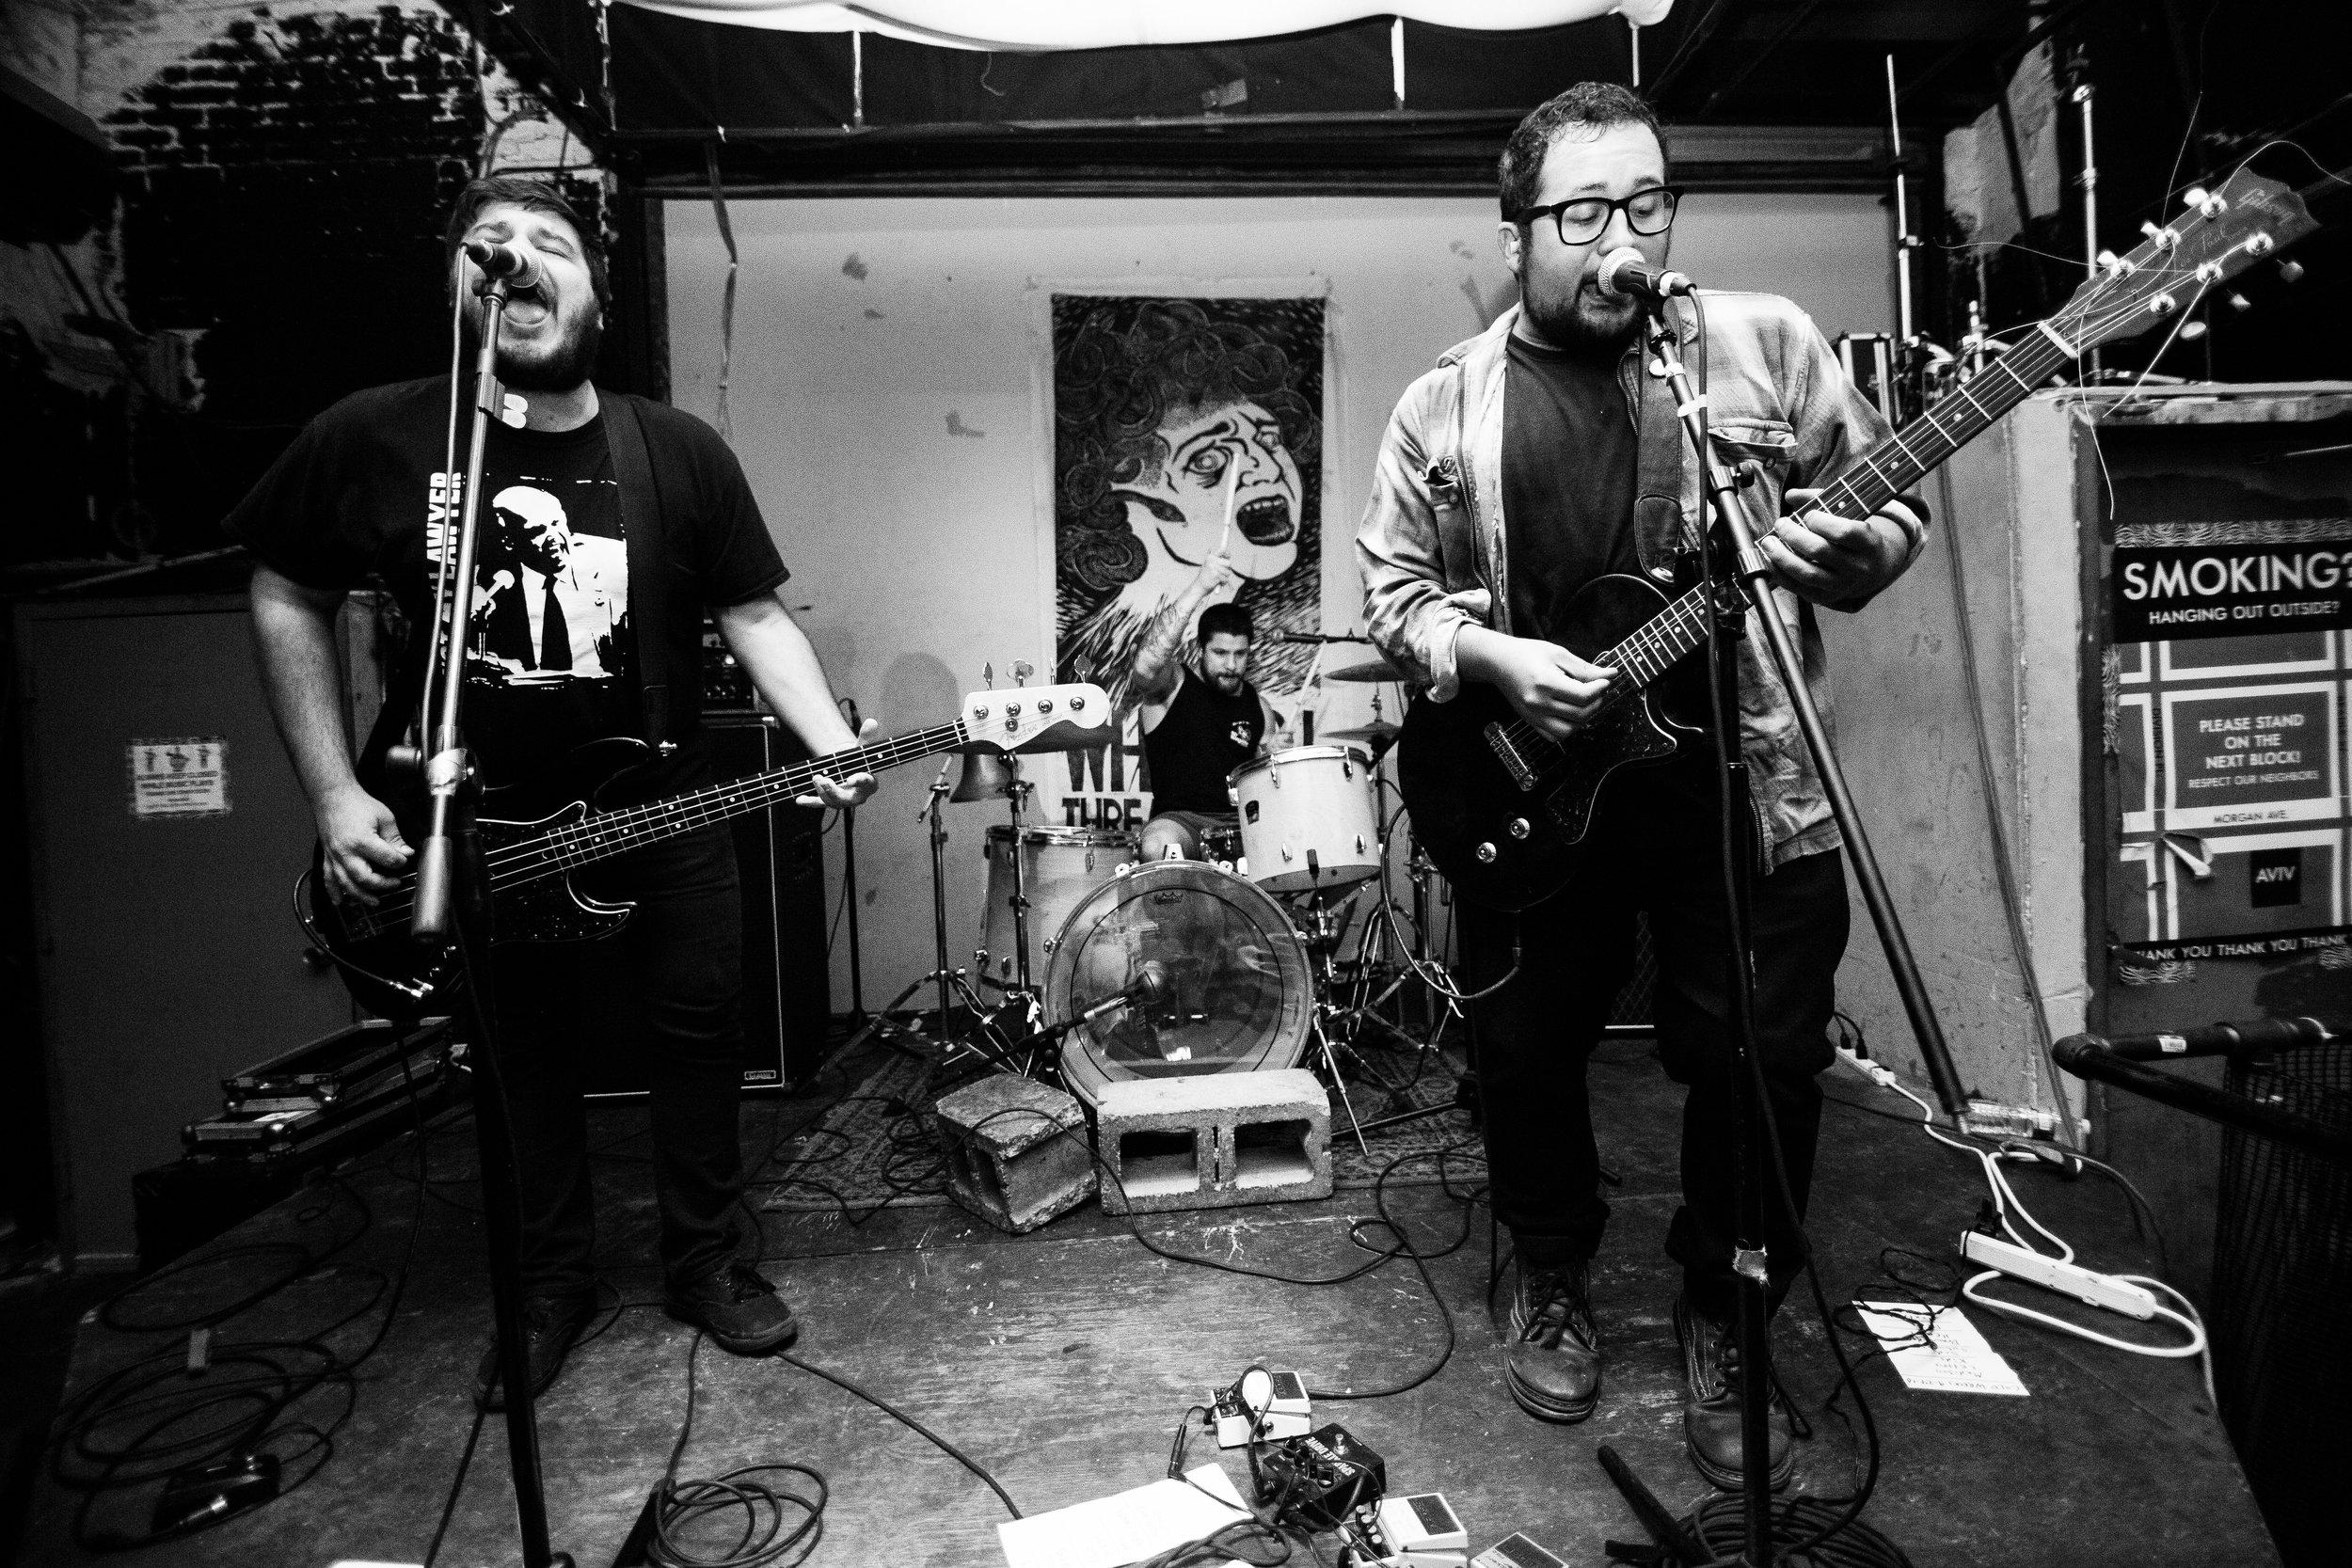 Timeshares perform at AVIV in Brooklyn, New York, September 24,2016.